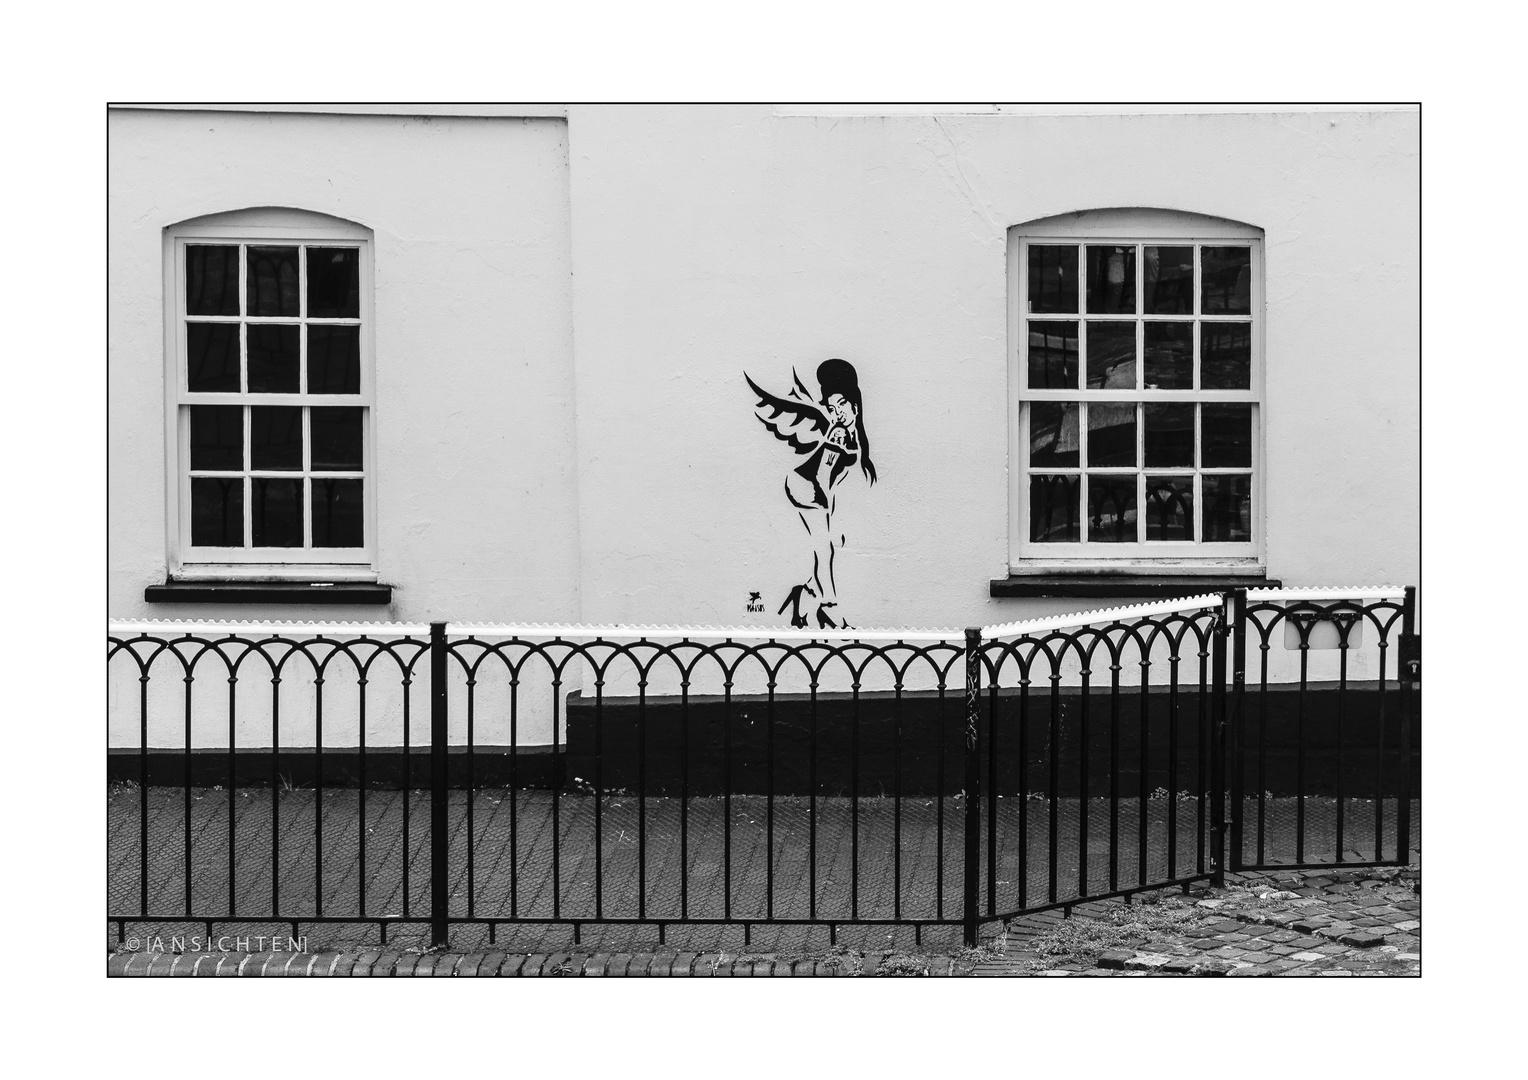 London 014 - Dancing AMY